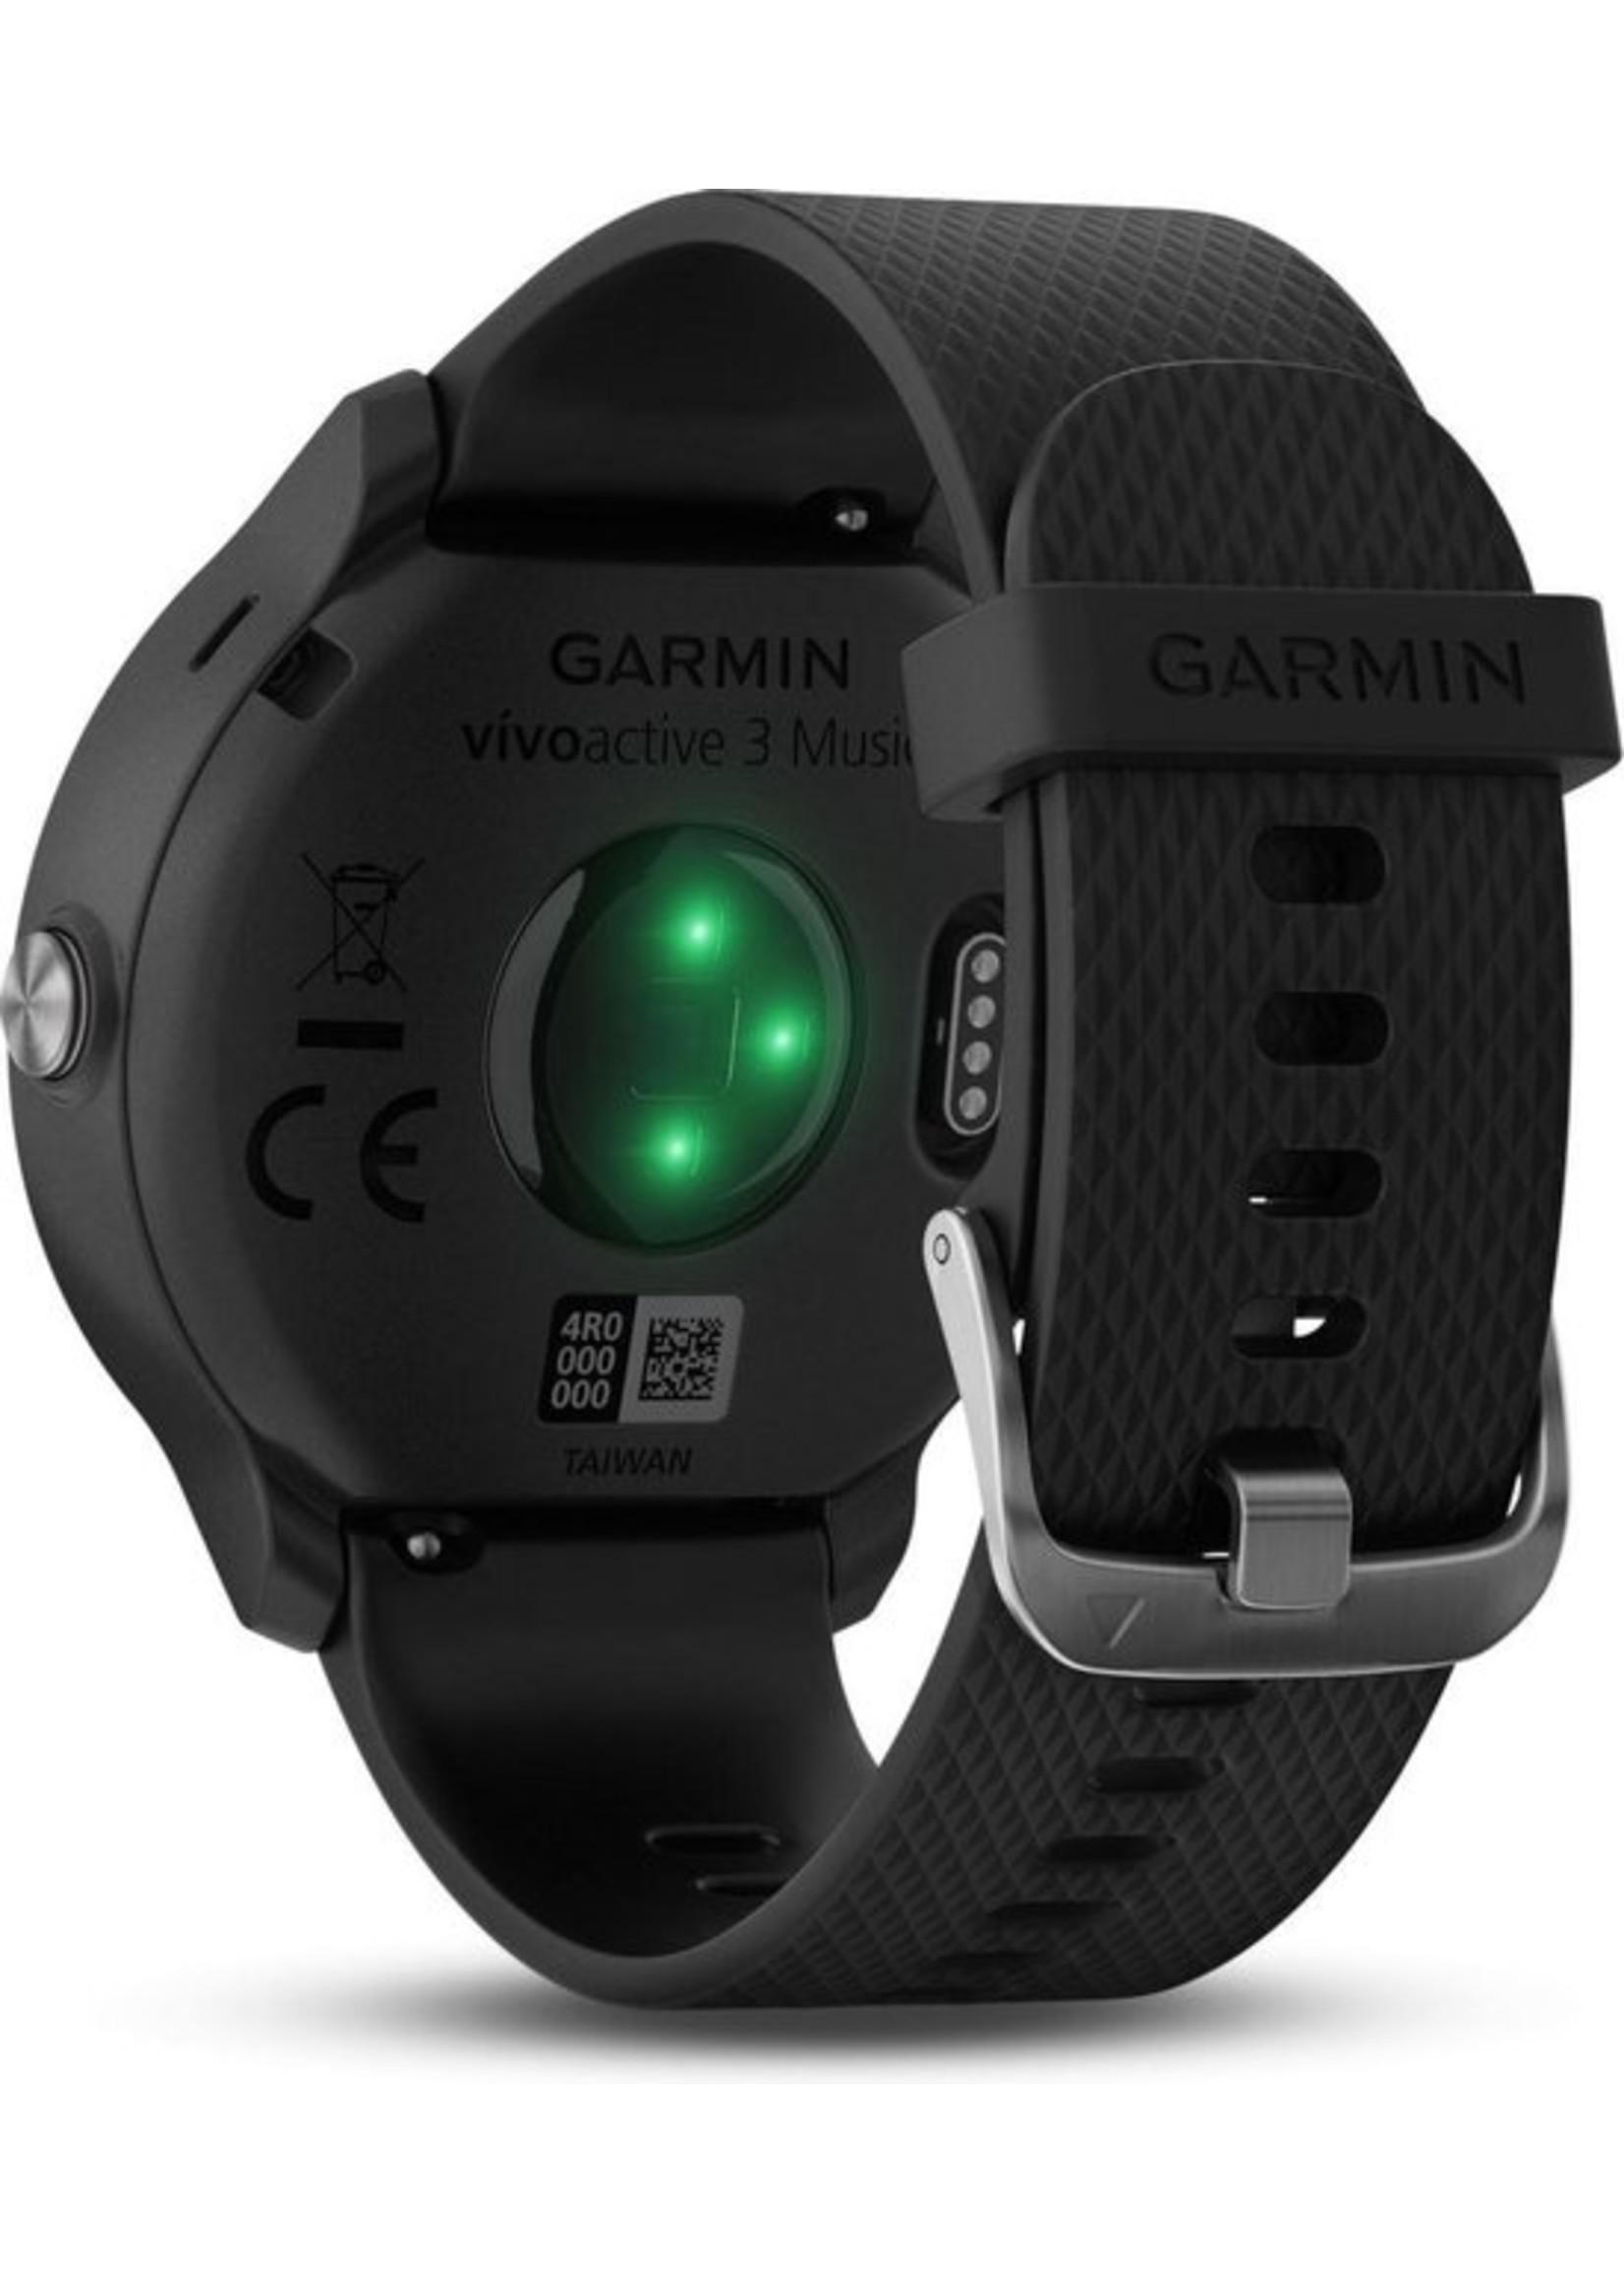 Garmin Garmin vivoactive 3 Music koopjeshoek